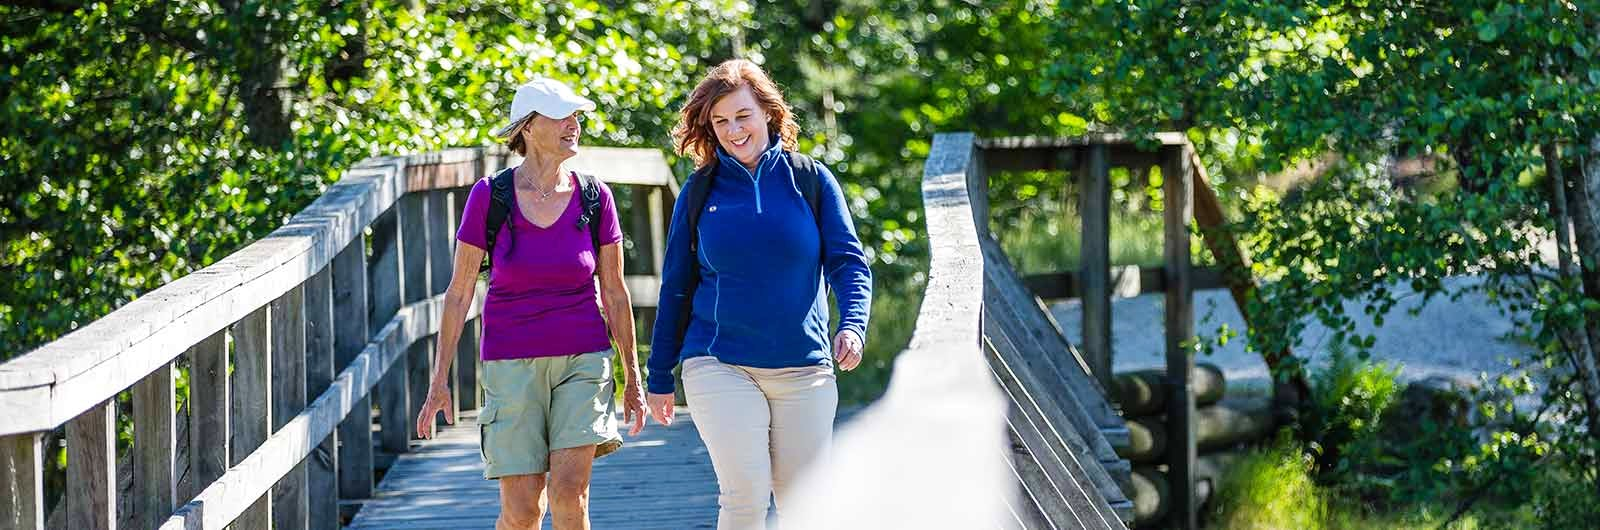 Signature Trail Northern Sormland Swedish Tourist Association